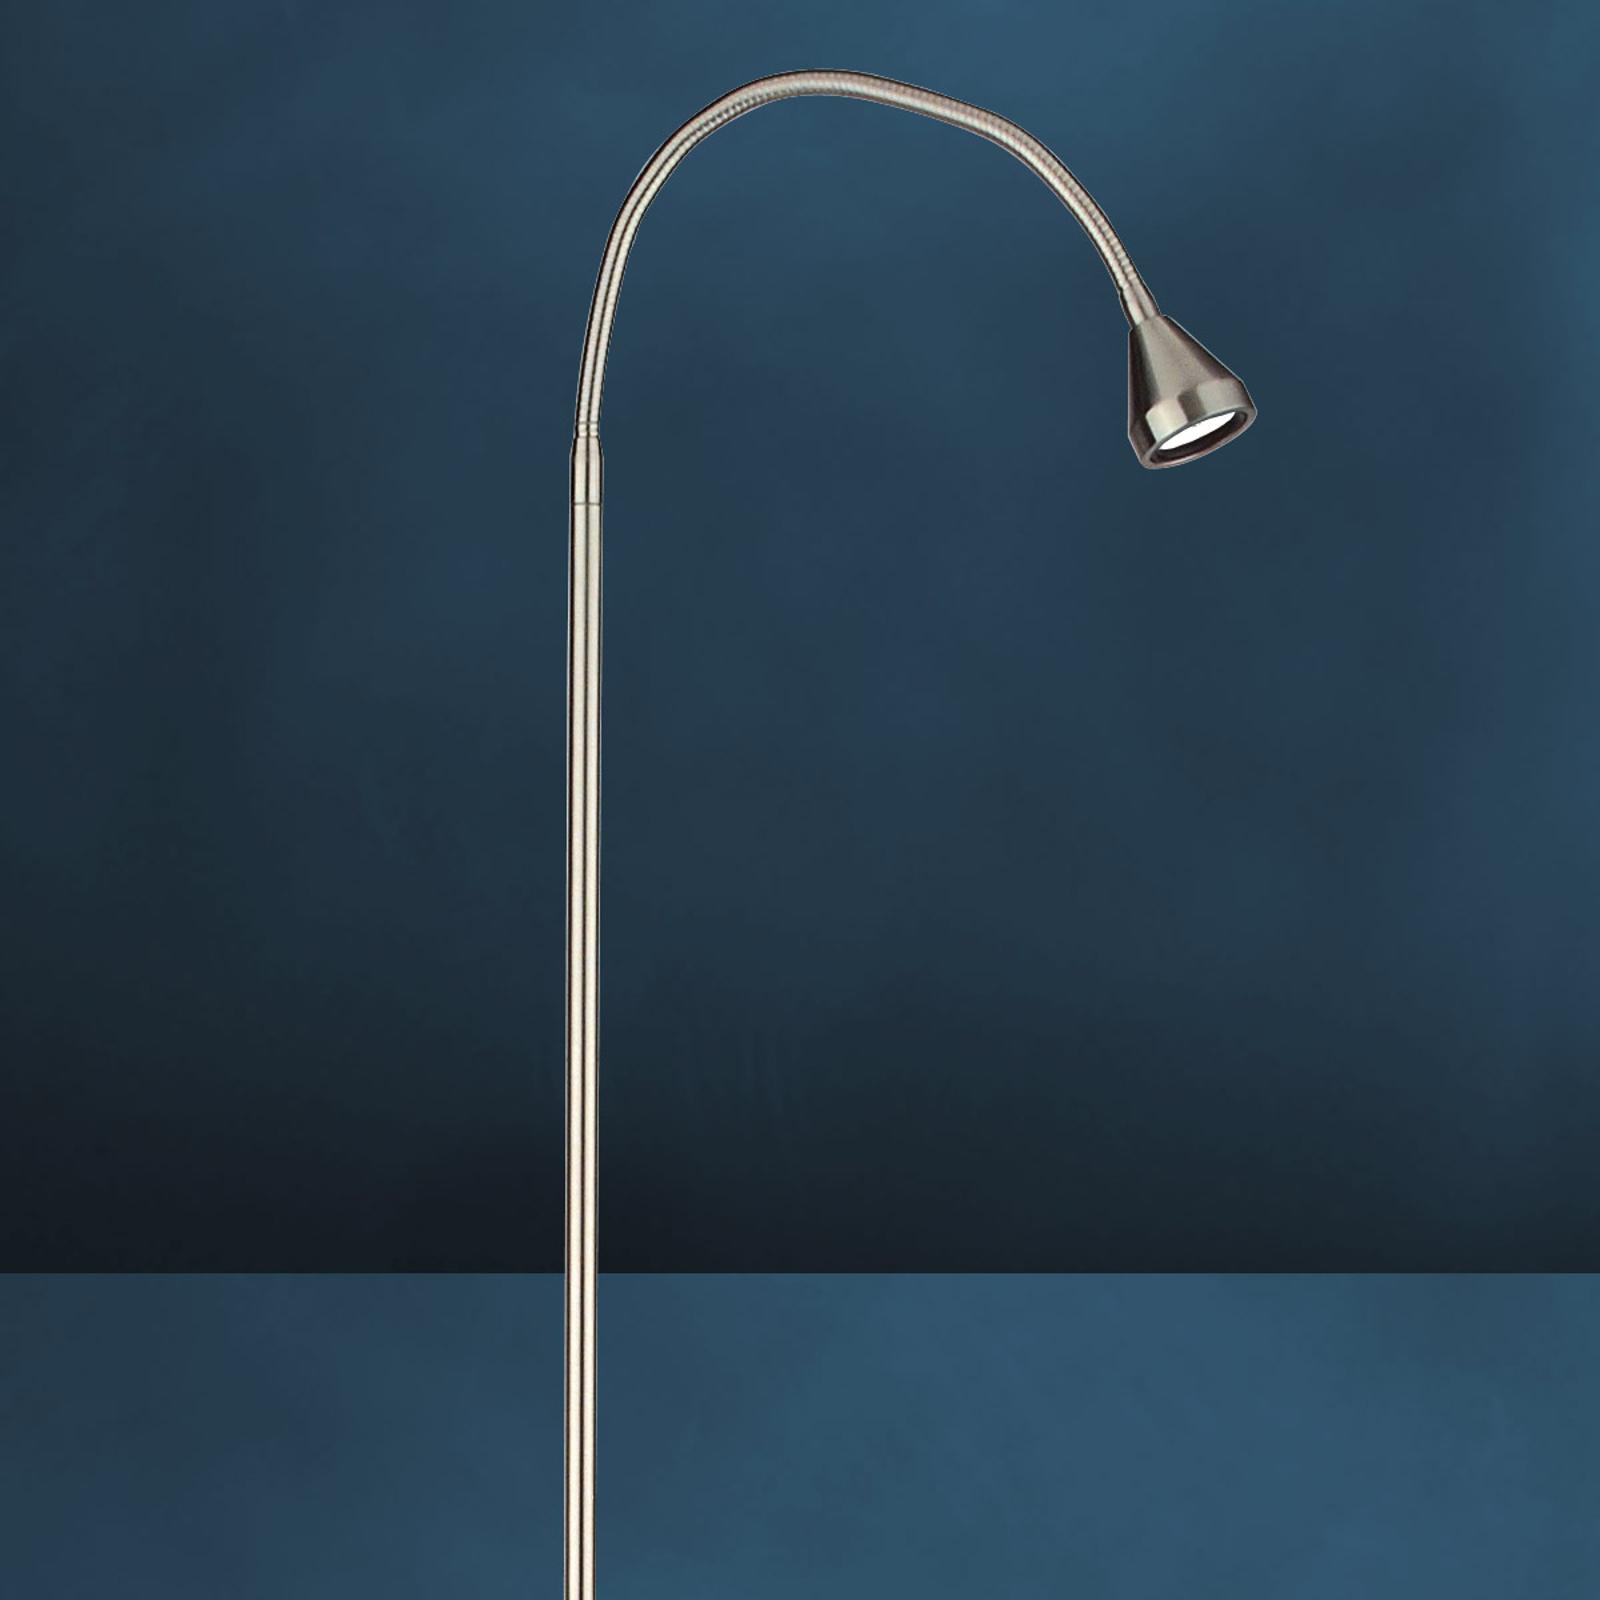 Moderne LED-Stehleuchte MINI, universalweiß